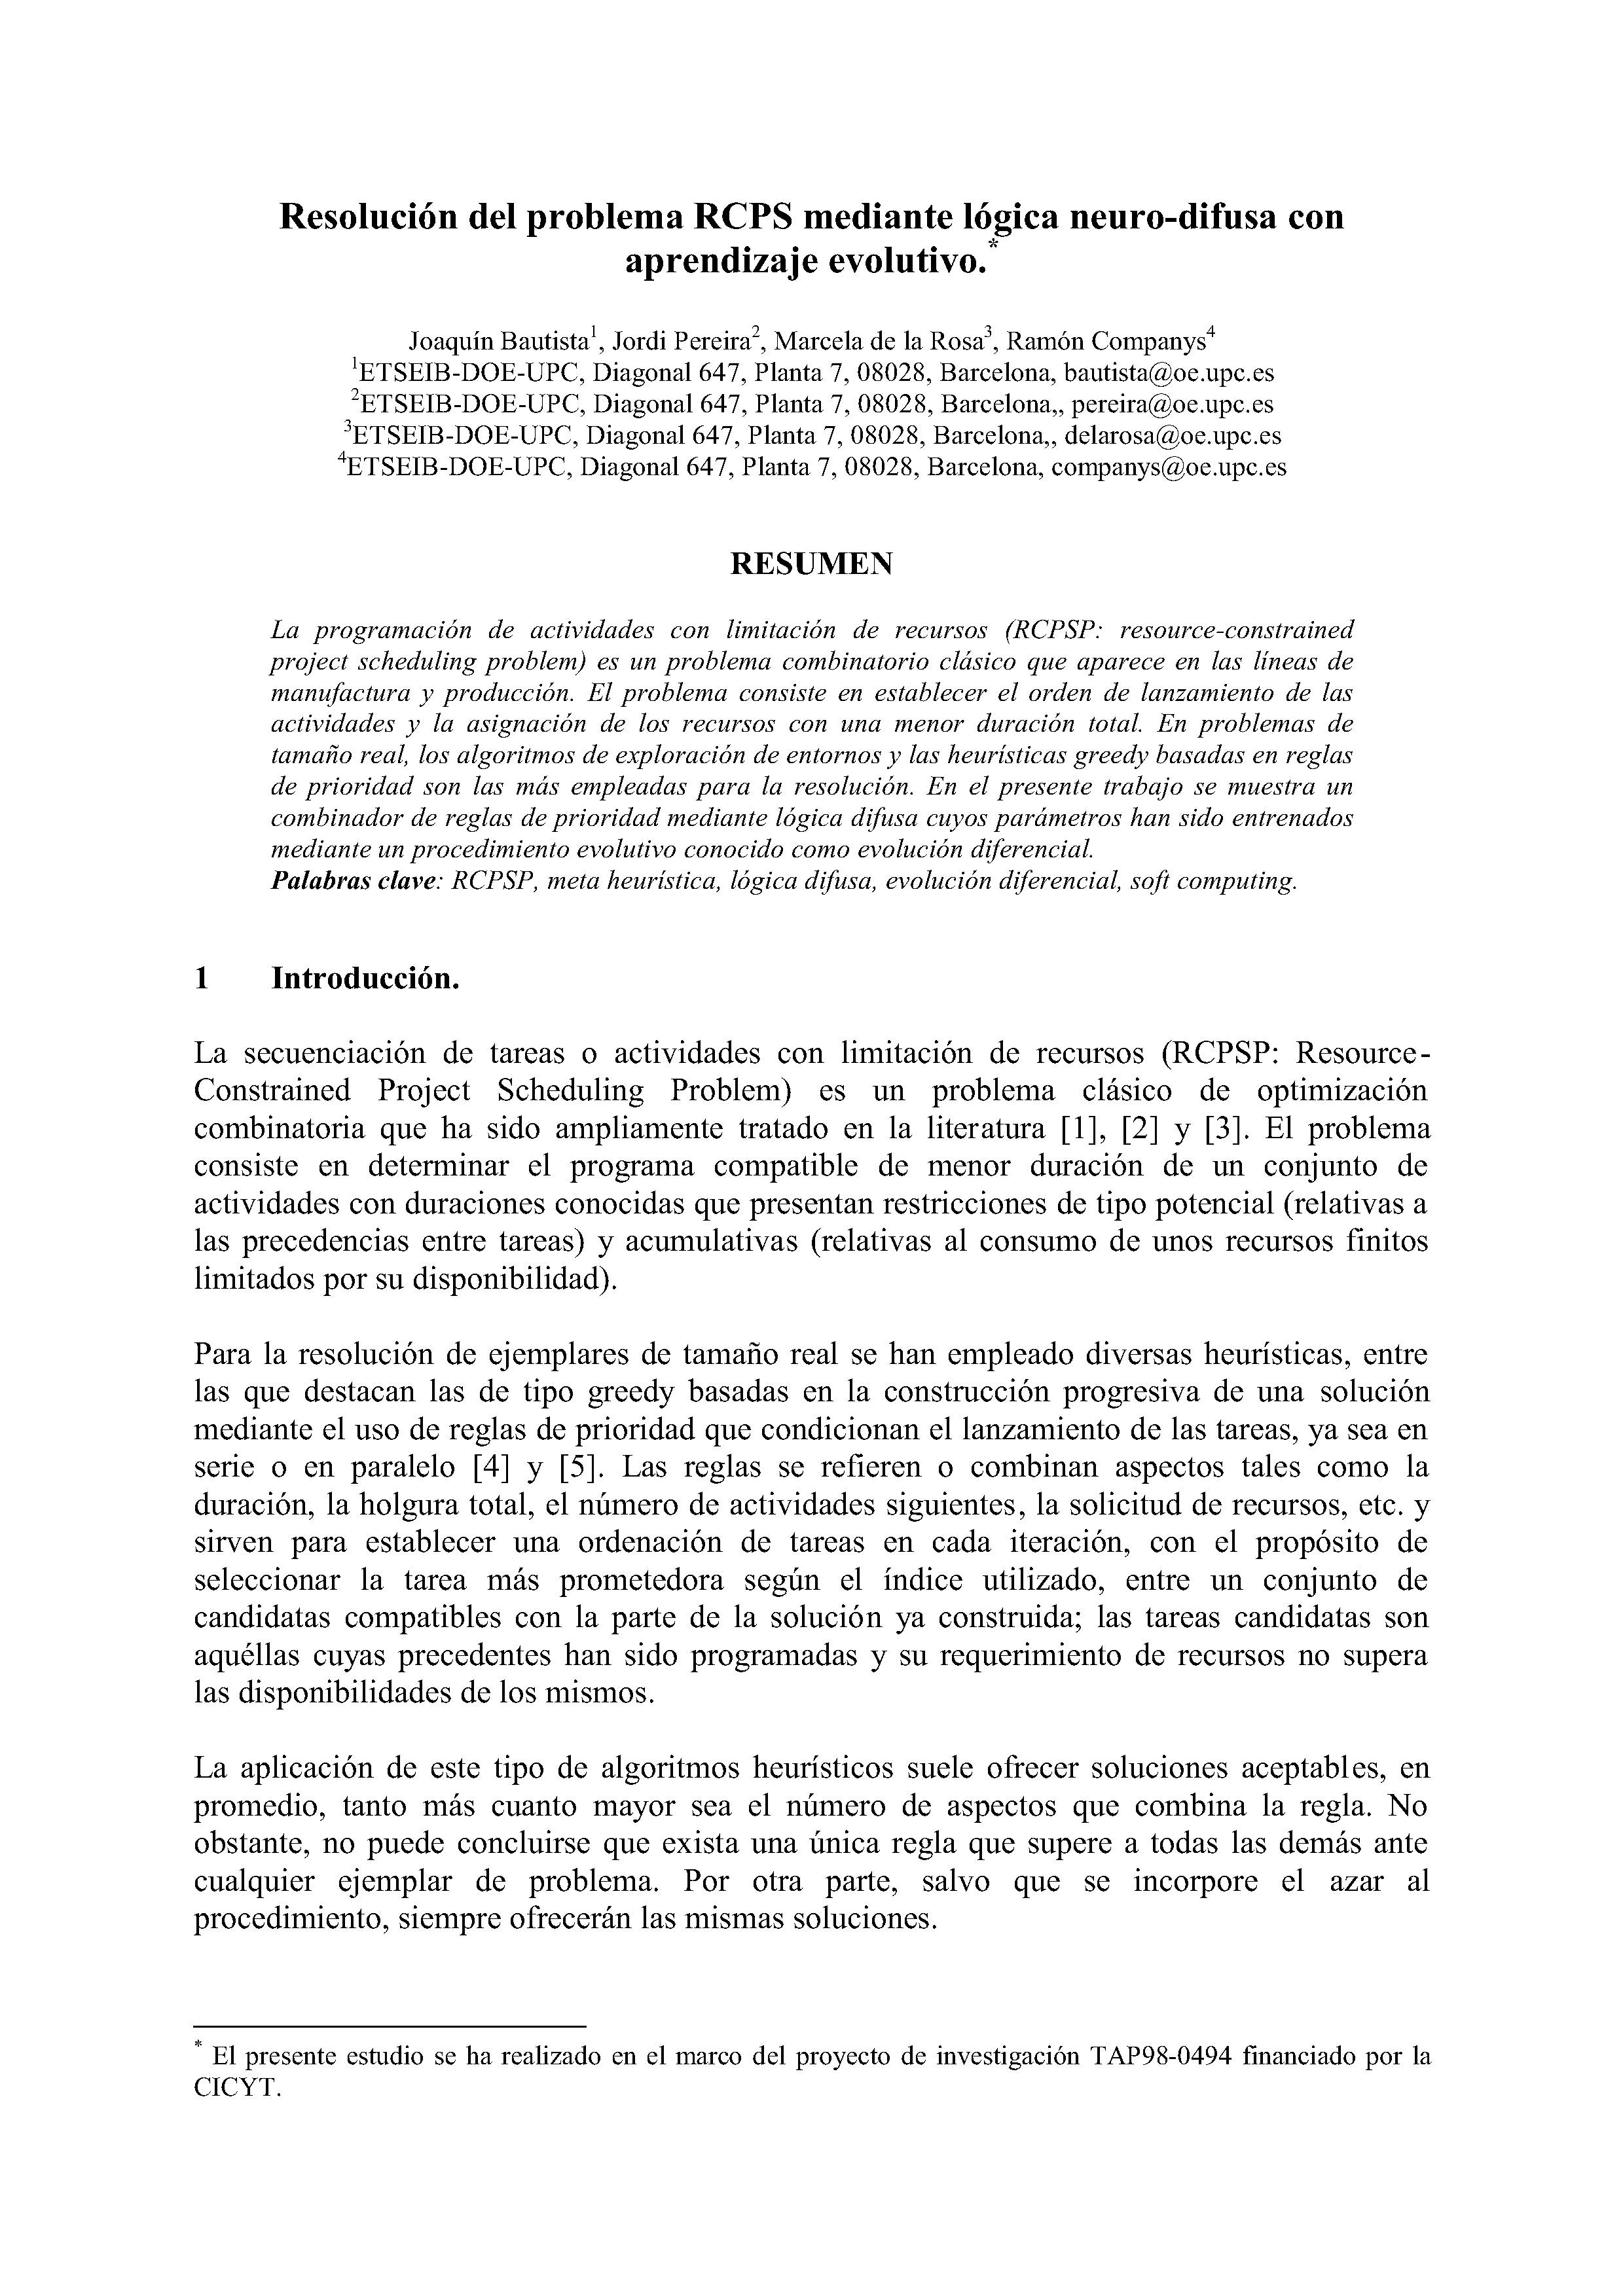 Resolución del problema RCPS mediante lógica neuro-difusa con aprendizaje evolutivo.